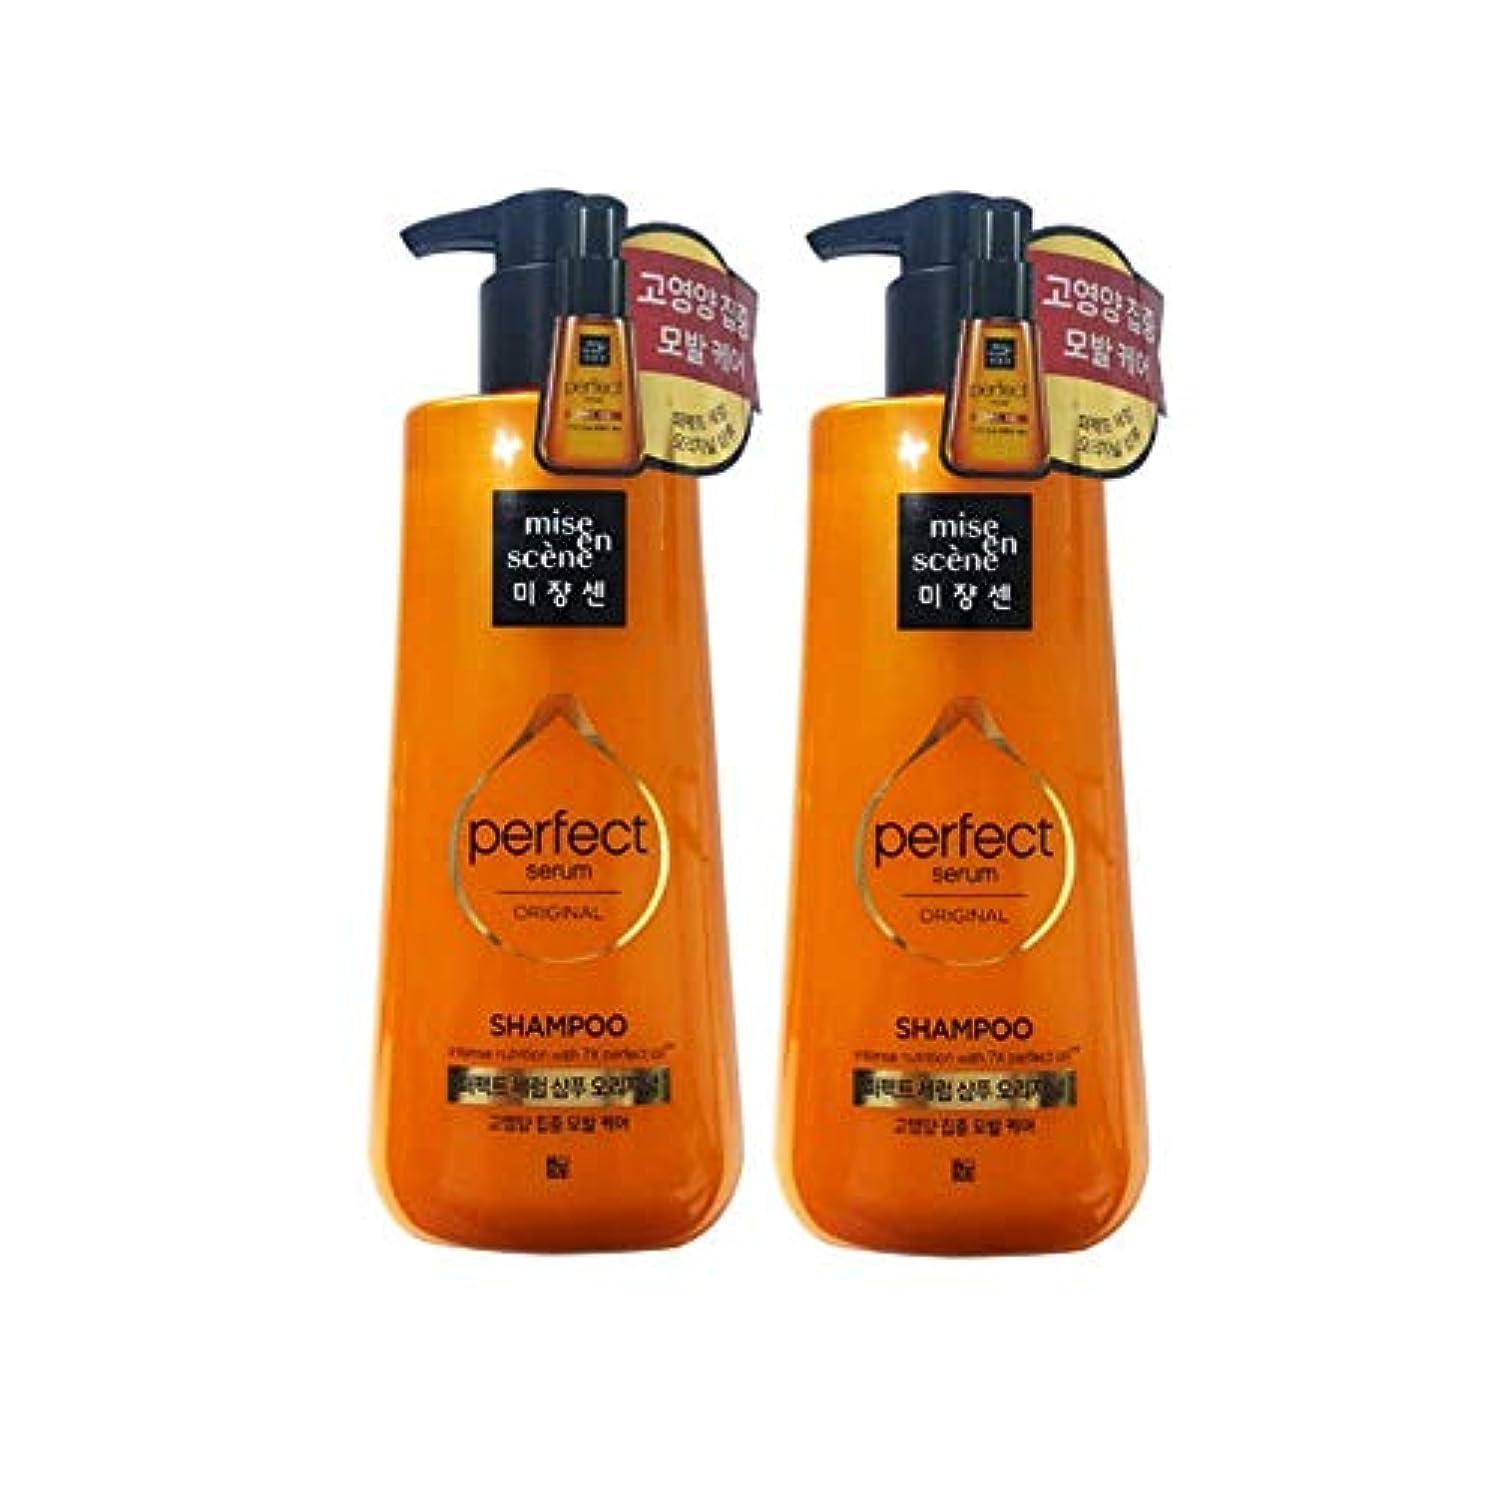 [miseenscene] ミジャンセン パーフェクトセラム シャンプー オリジナル 680ml×2本(perfect serum shampoo 680ml×2) korea cosmetic